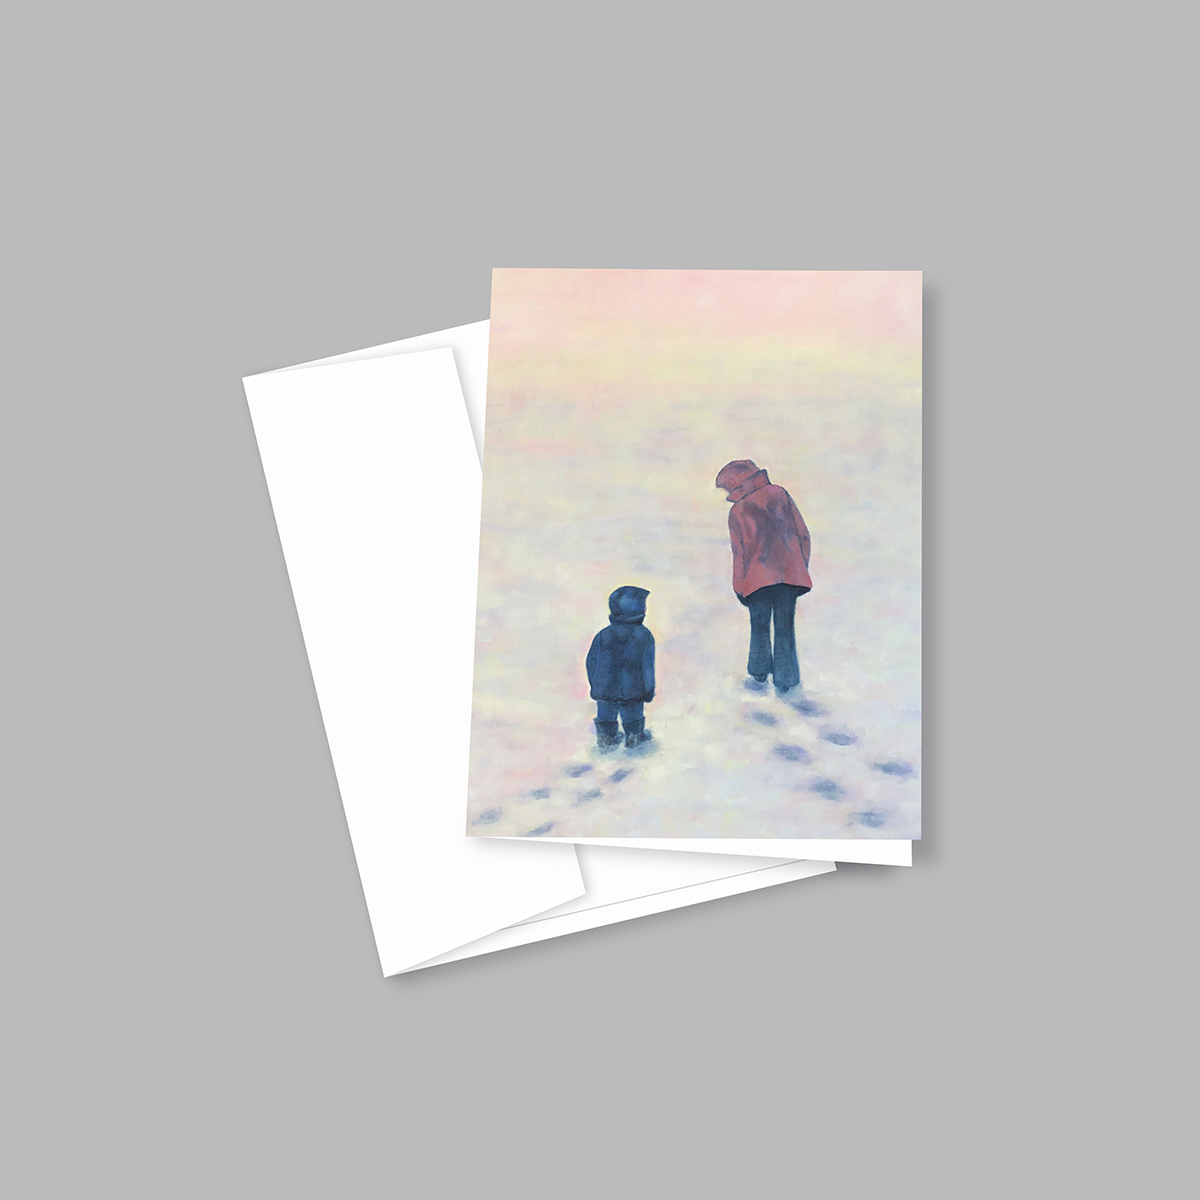 Winter IV by Ingrid Connidis